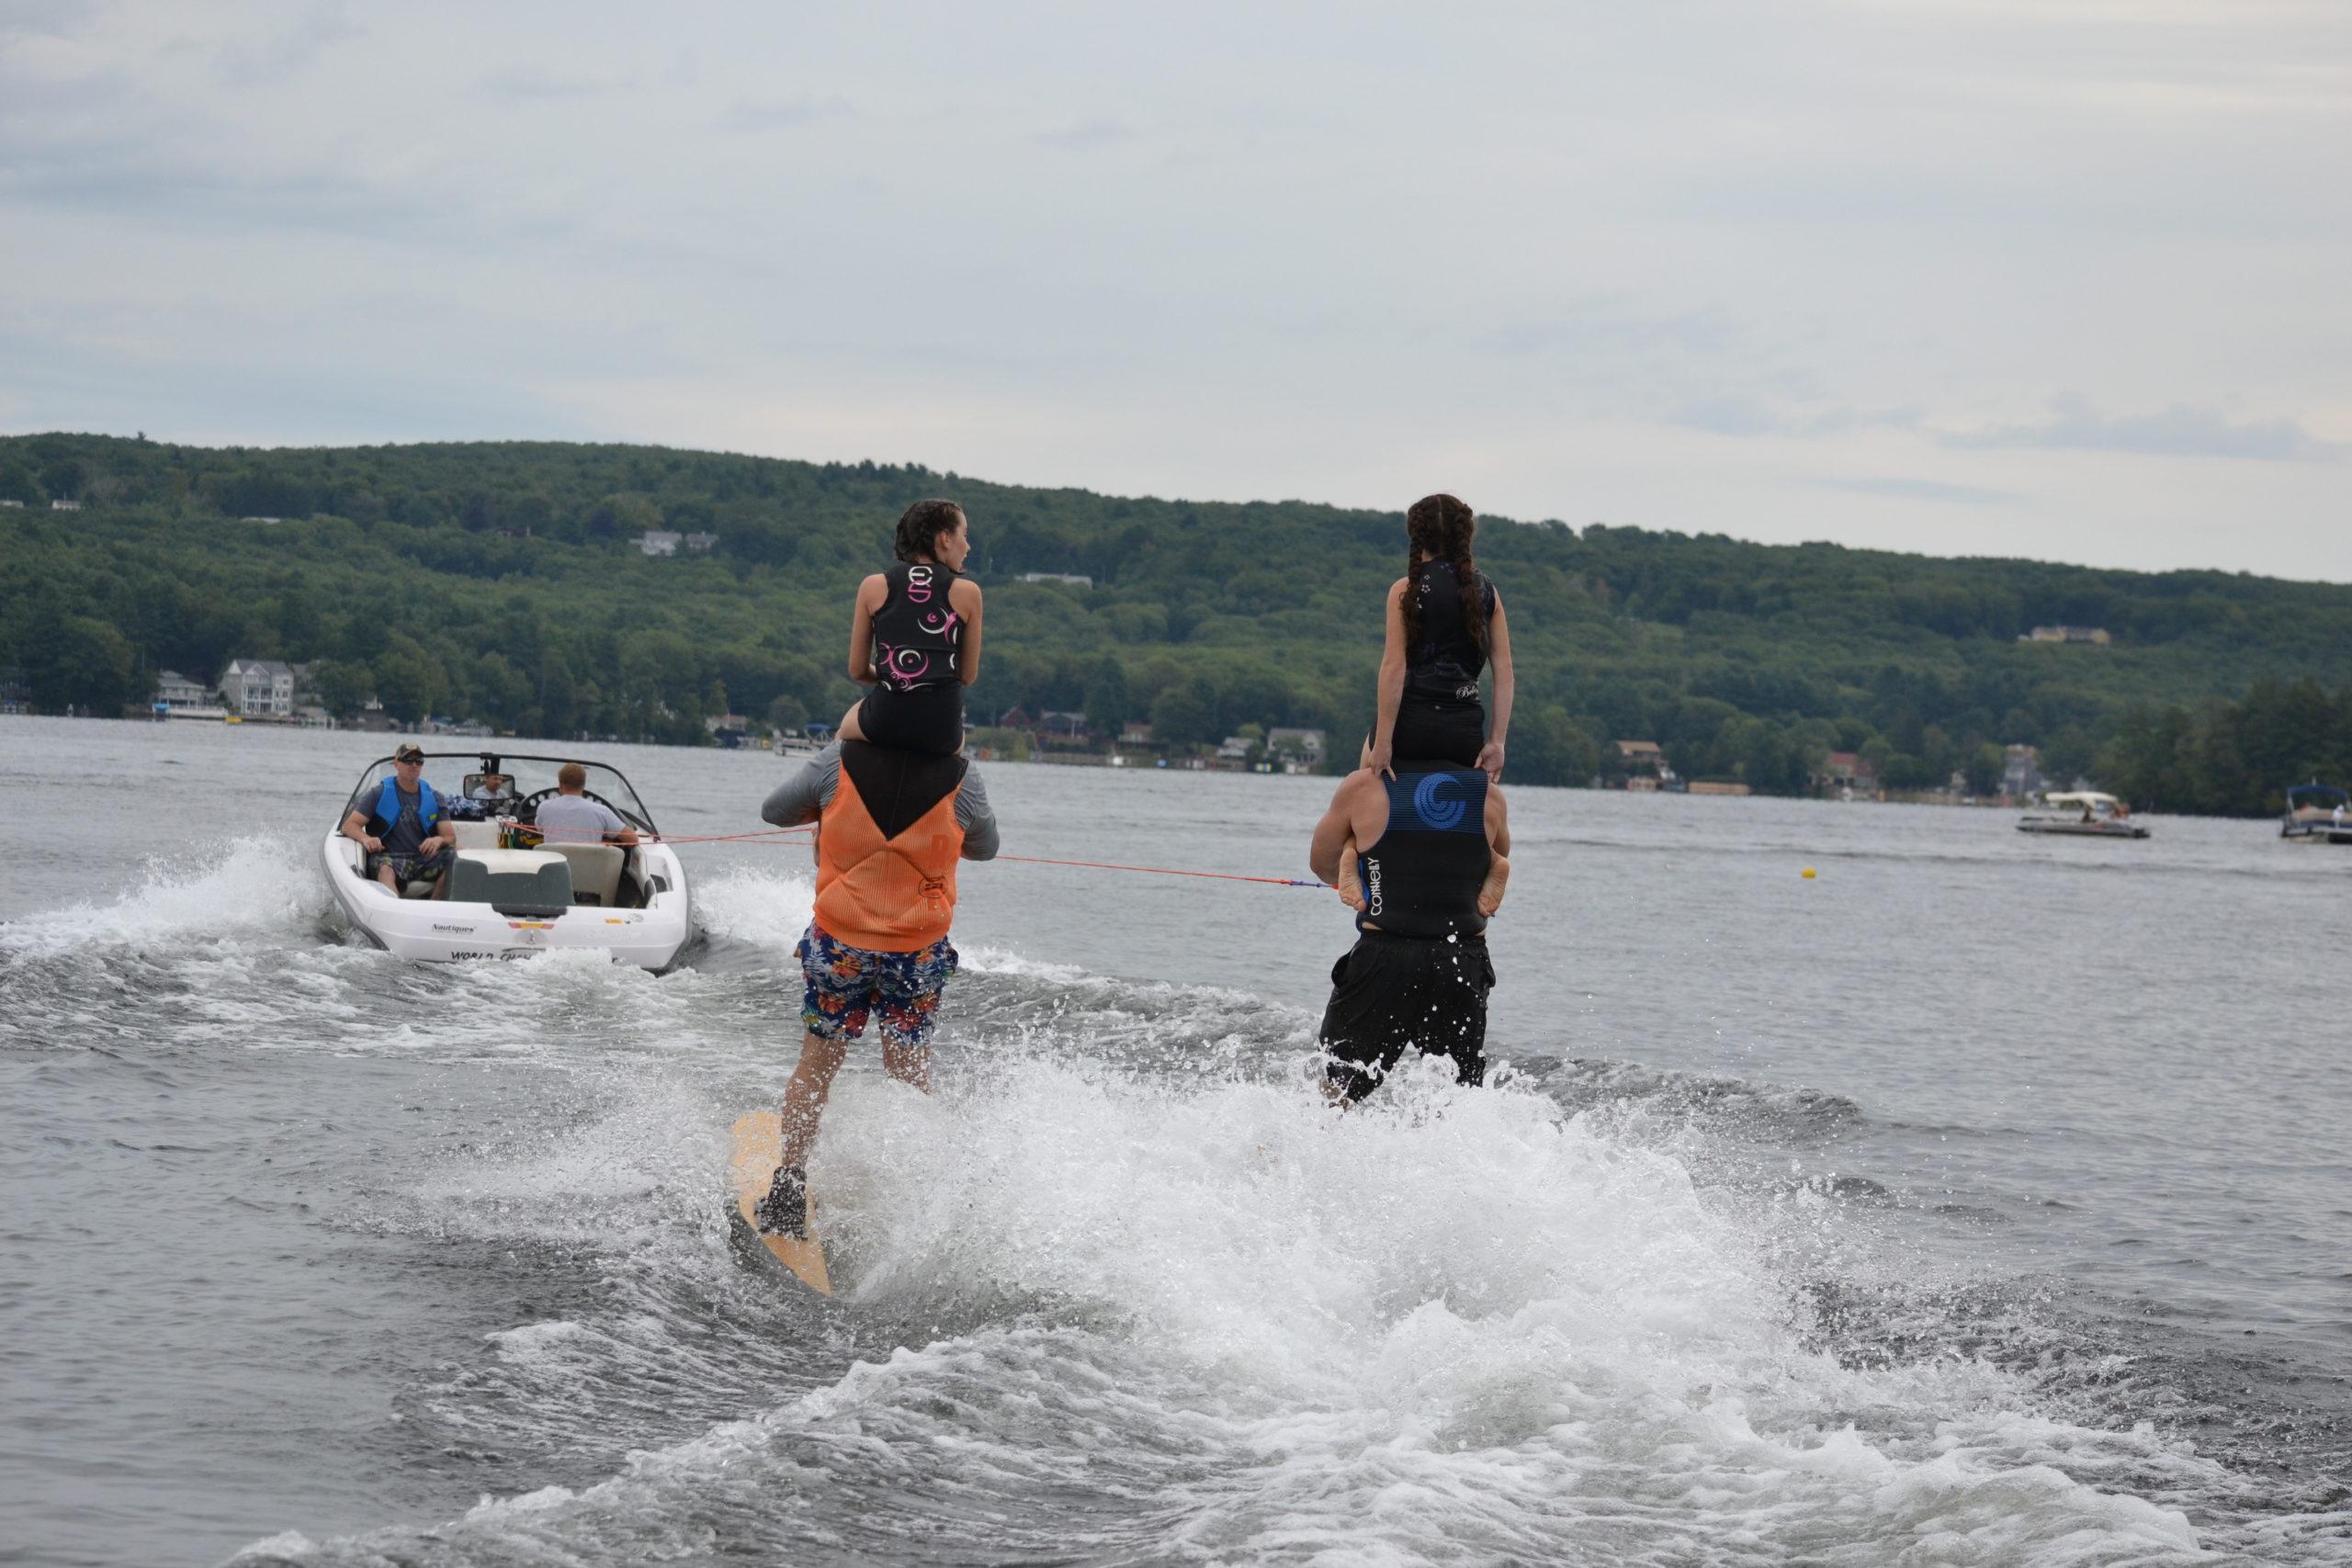 2018 Water Ski Show Nipmuc Ski Club, Webster, MA